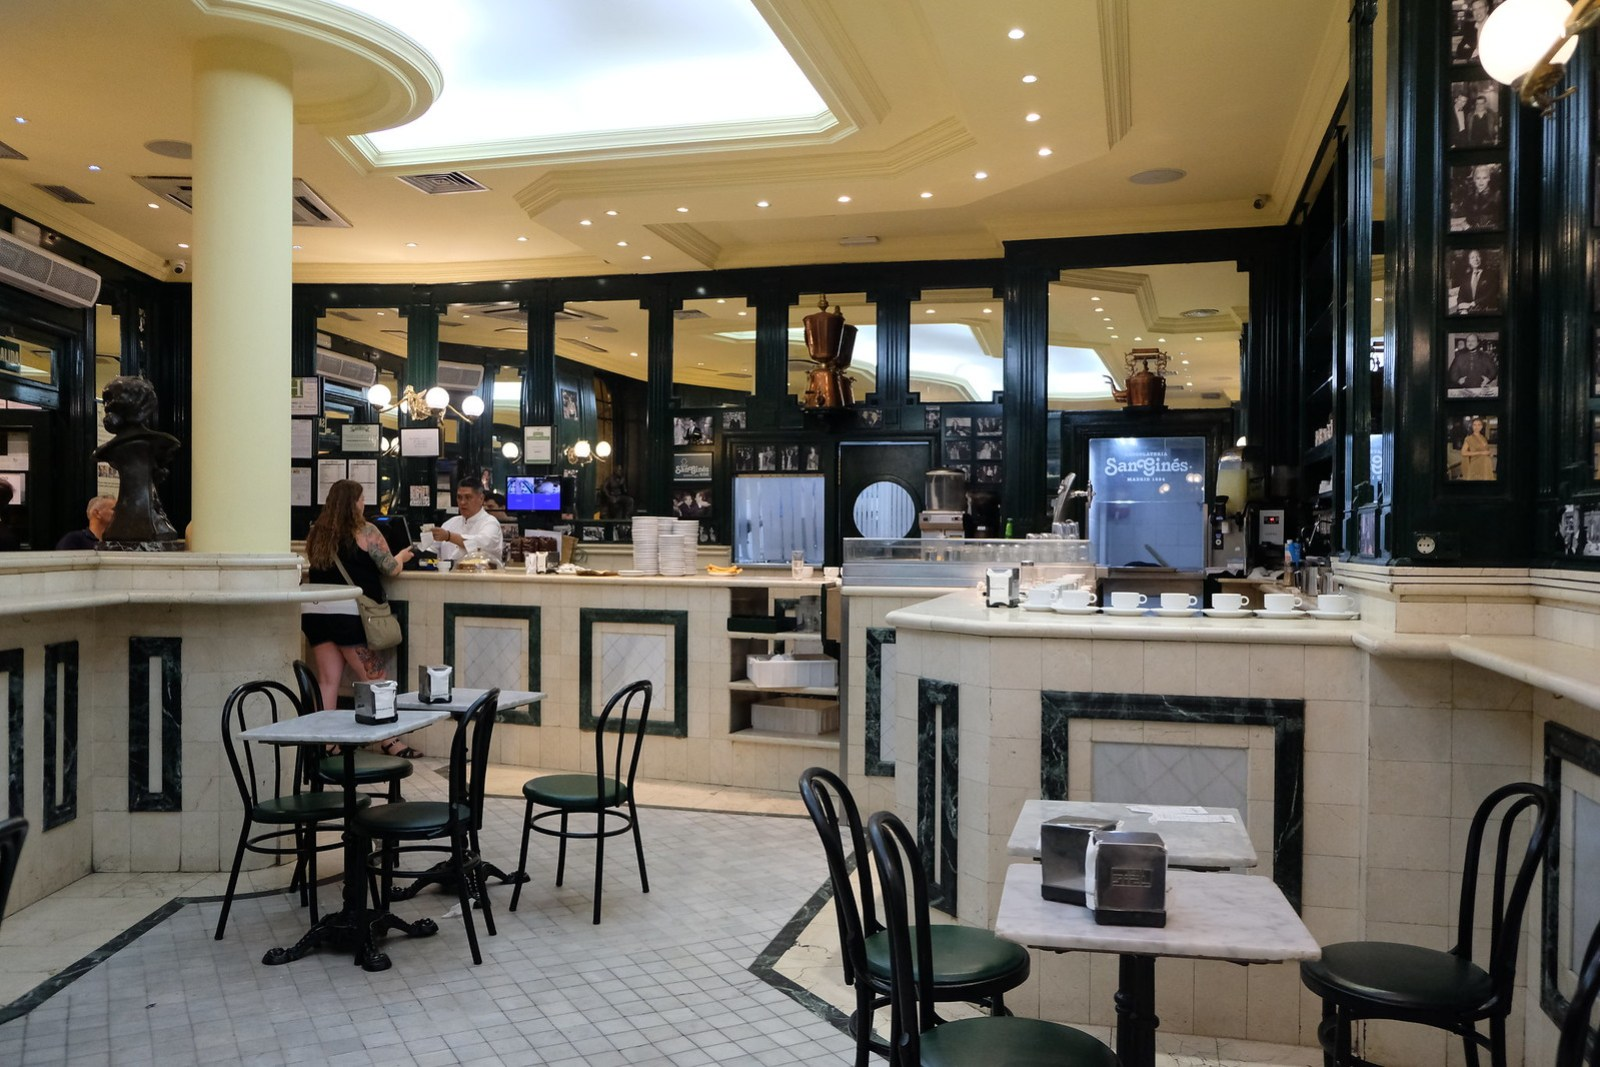 Inside Chocolateria San Gines